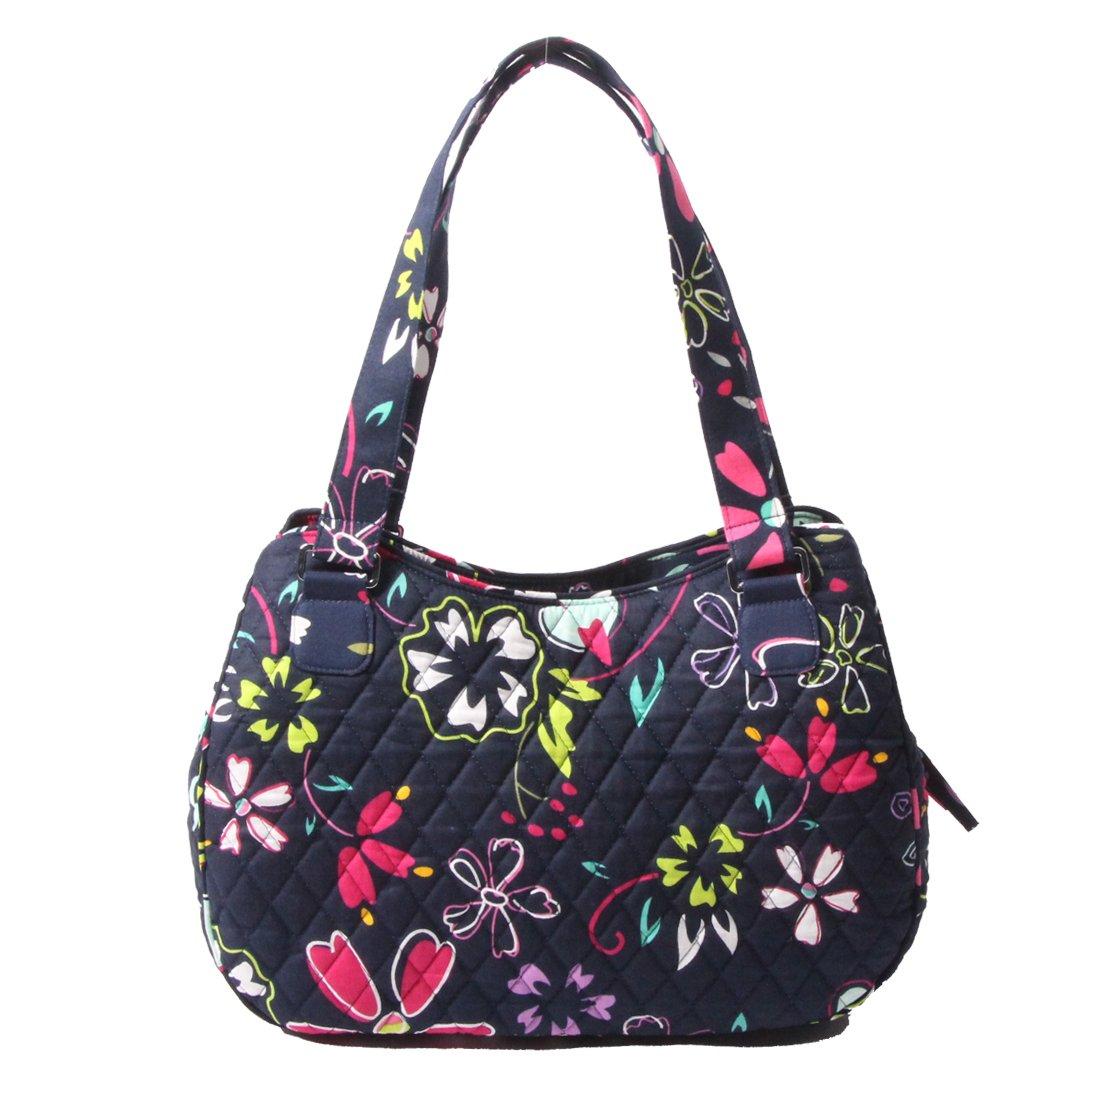 Quilted Cotton Handle Bags Shoulder Bag (Navy blue)